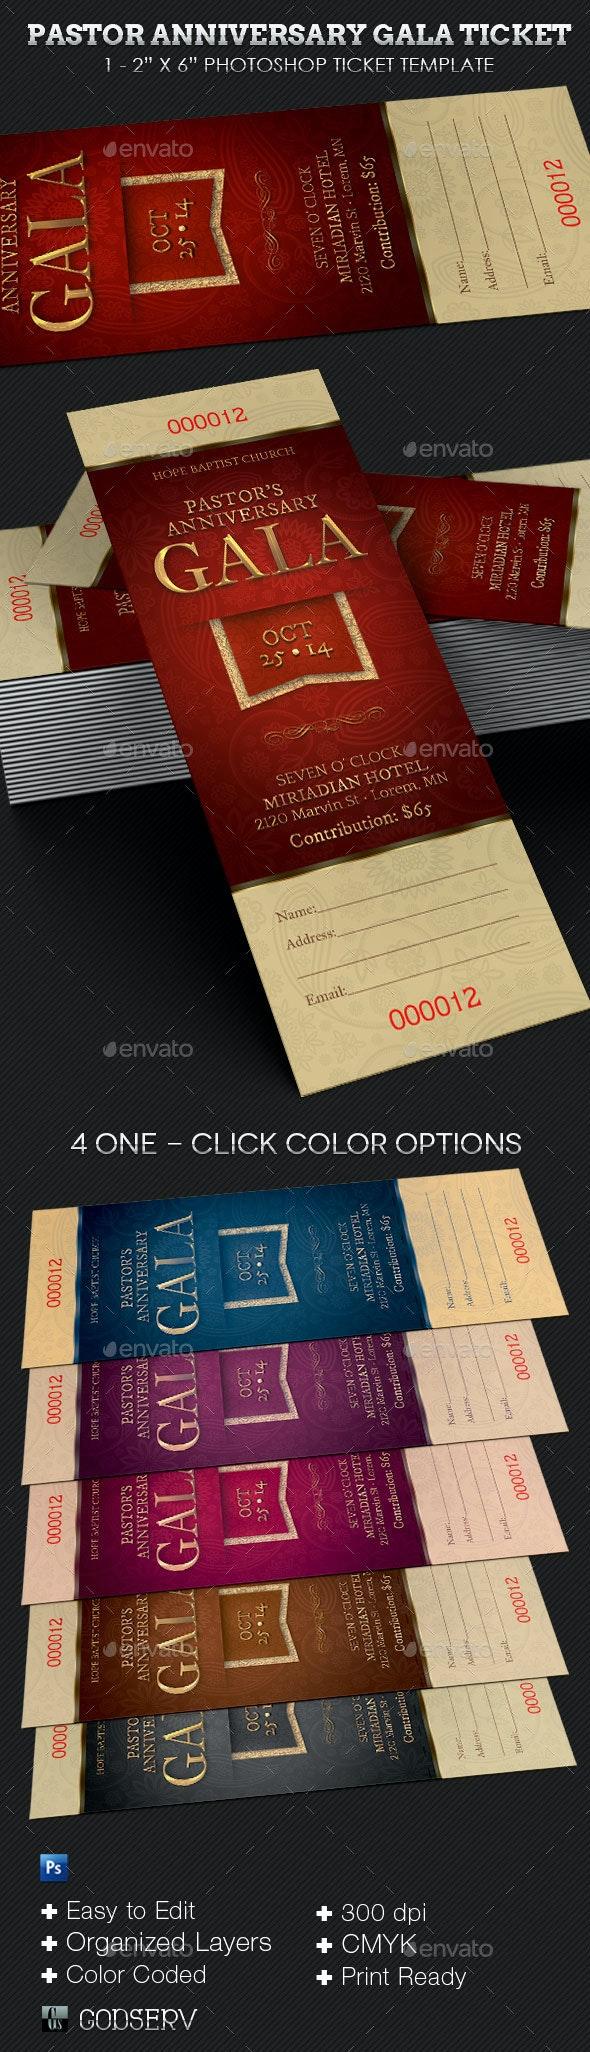 Pastor Anniversary Gala Ticket Template - Miscellaneous Print Templates